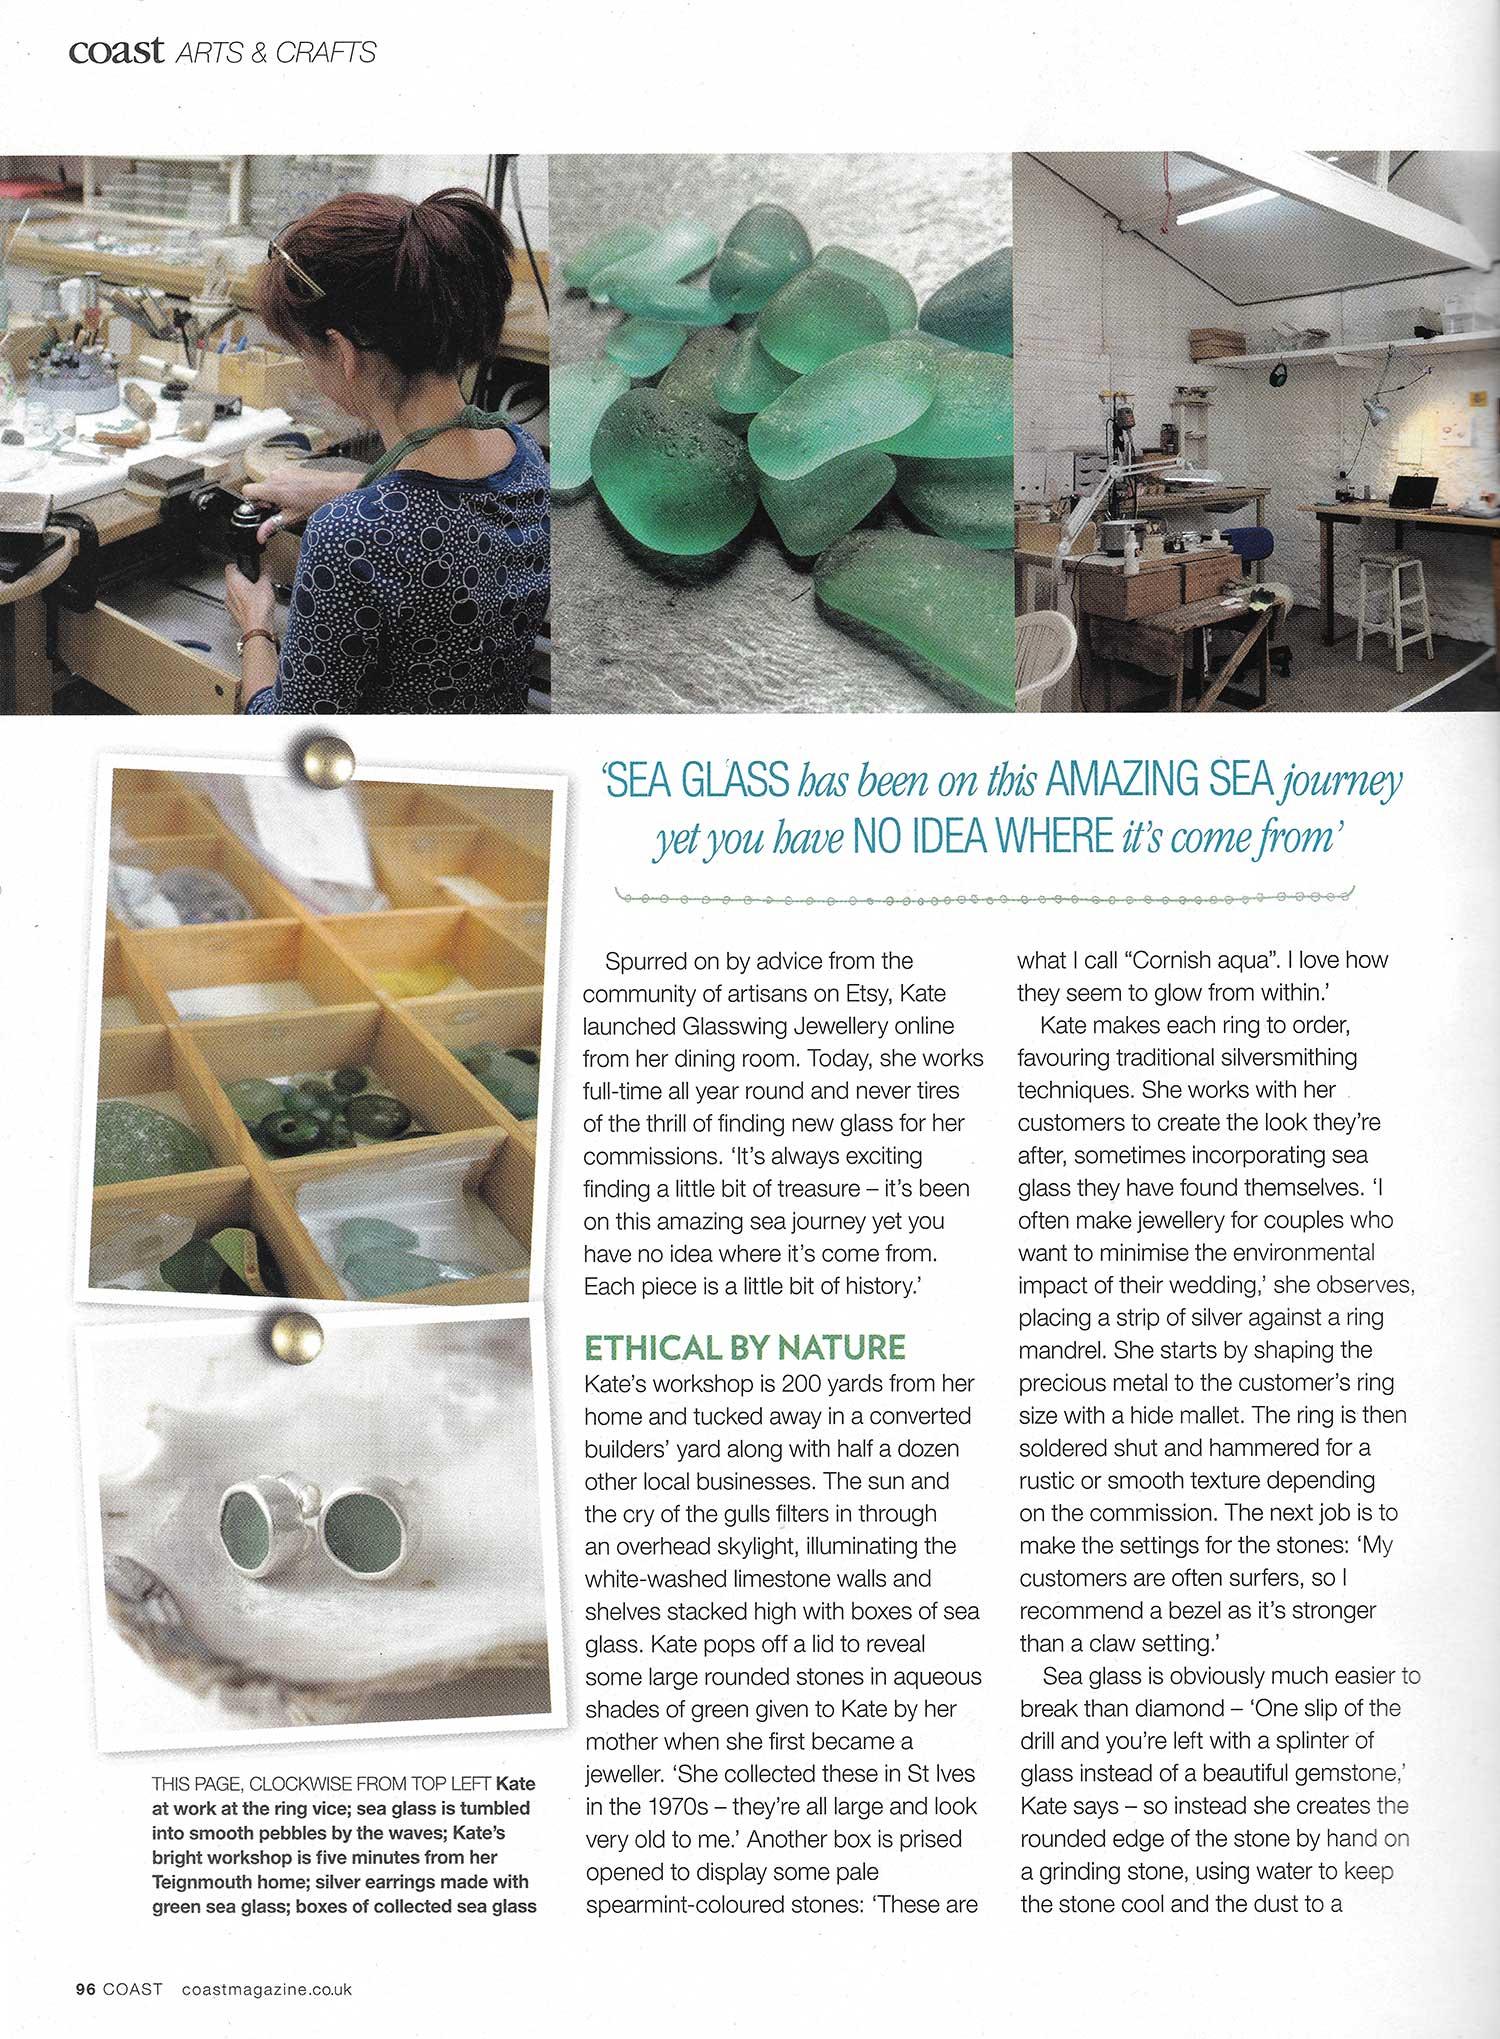 Glasswing-jewellery-coast-article-heart-of-glass-3.jpg